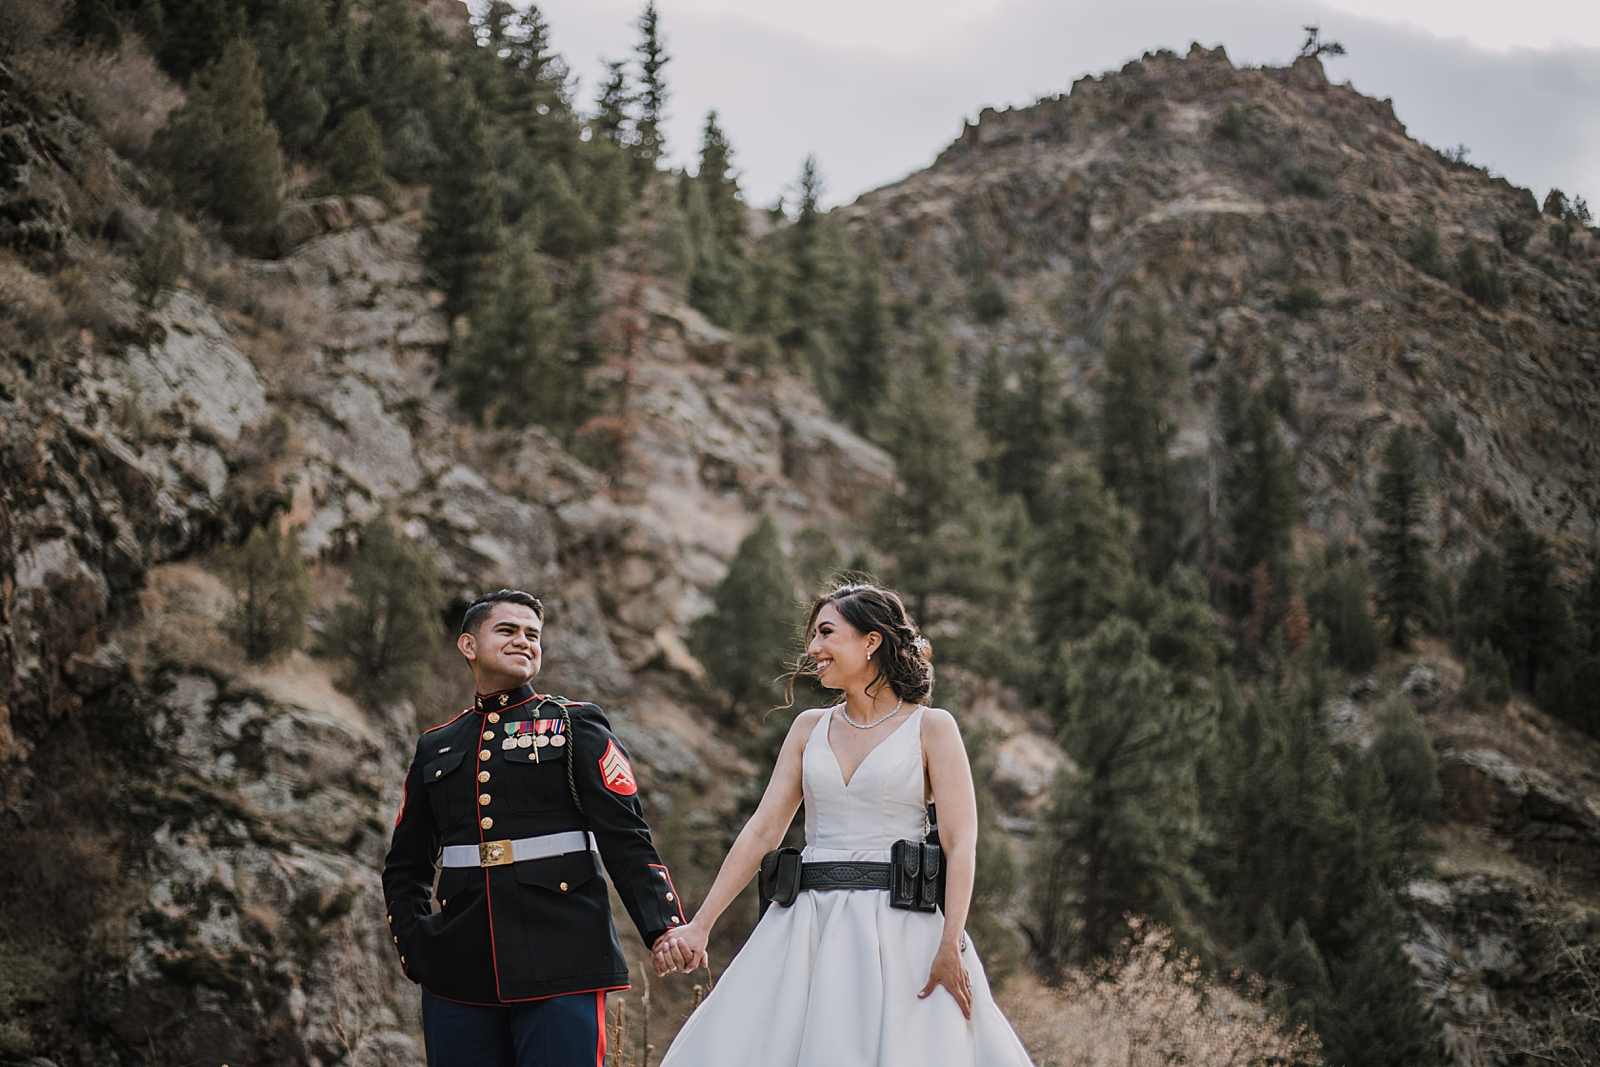 marine groom and police bride, hiking clear creek canyon, golden colorado wedding, golden colorado elopement, clear creek canyon climbing area